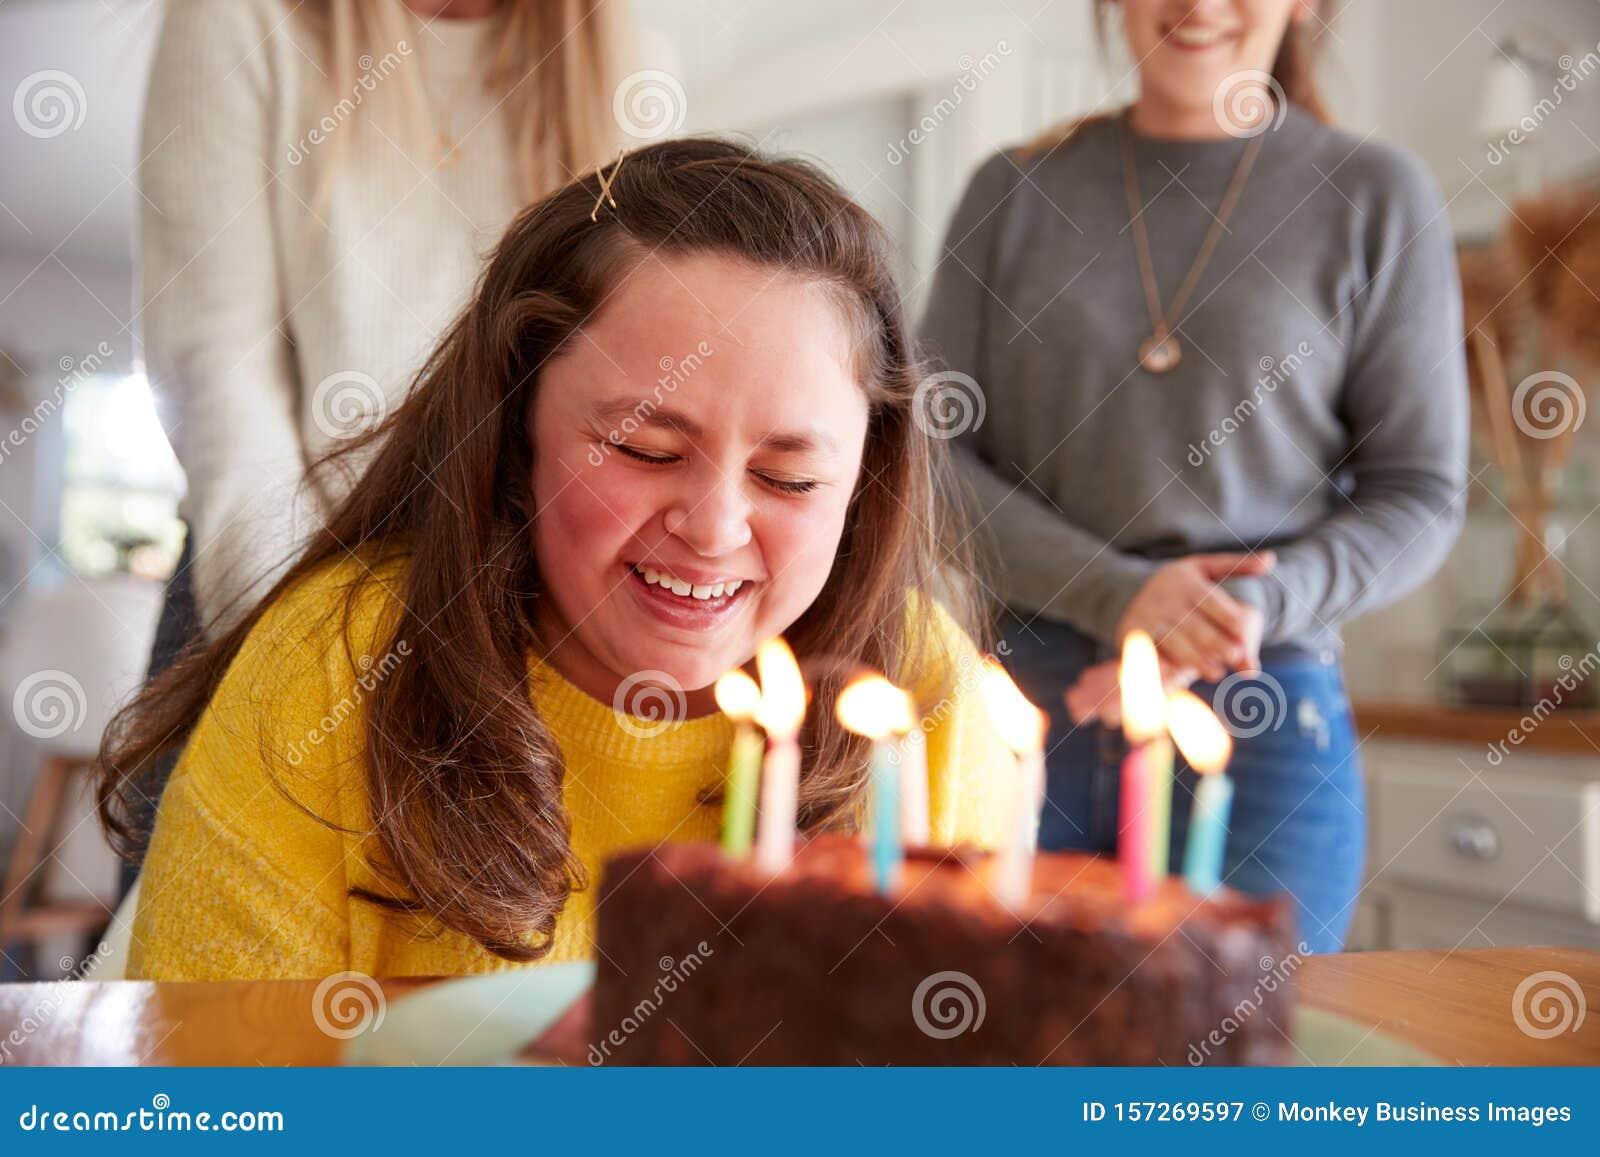 Geburtstag single frau